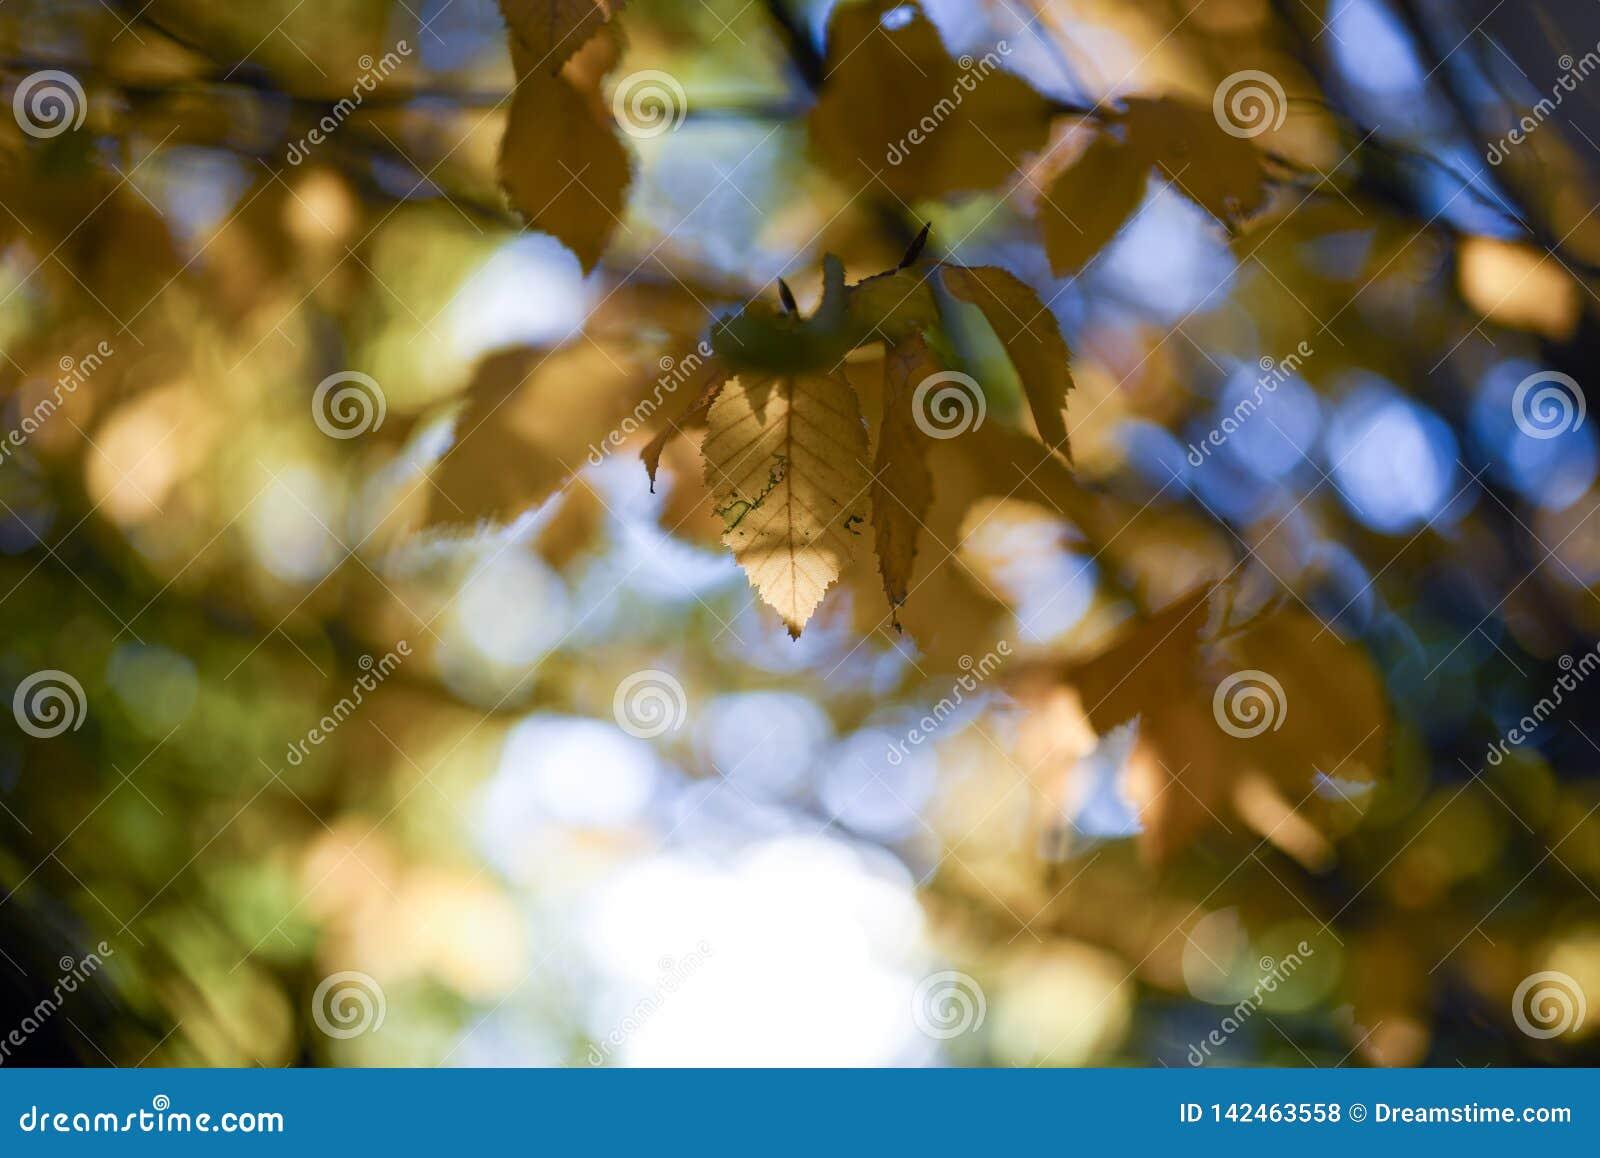 Листья листопада желтеют Bokeh